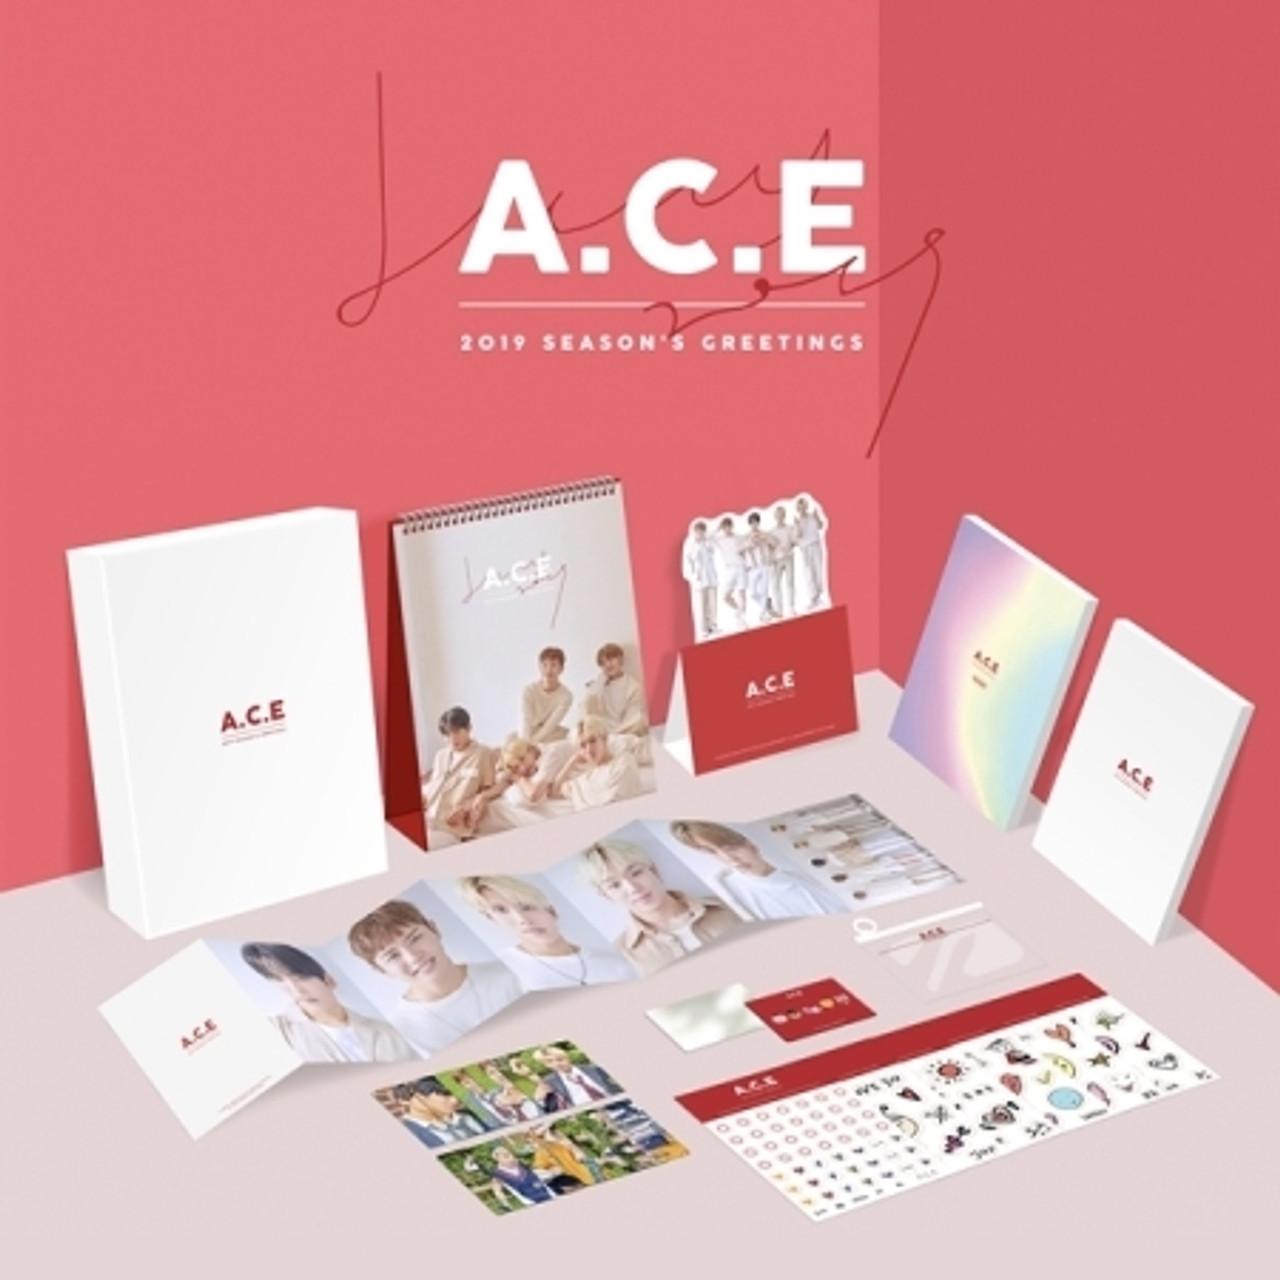 A.C.E - 2019 SEASON GREETINGS + Poster